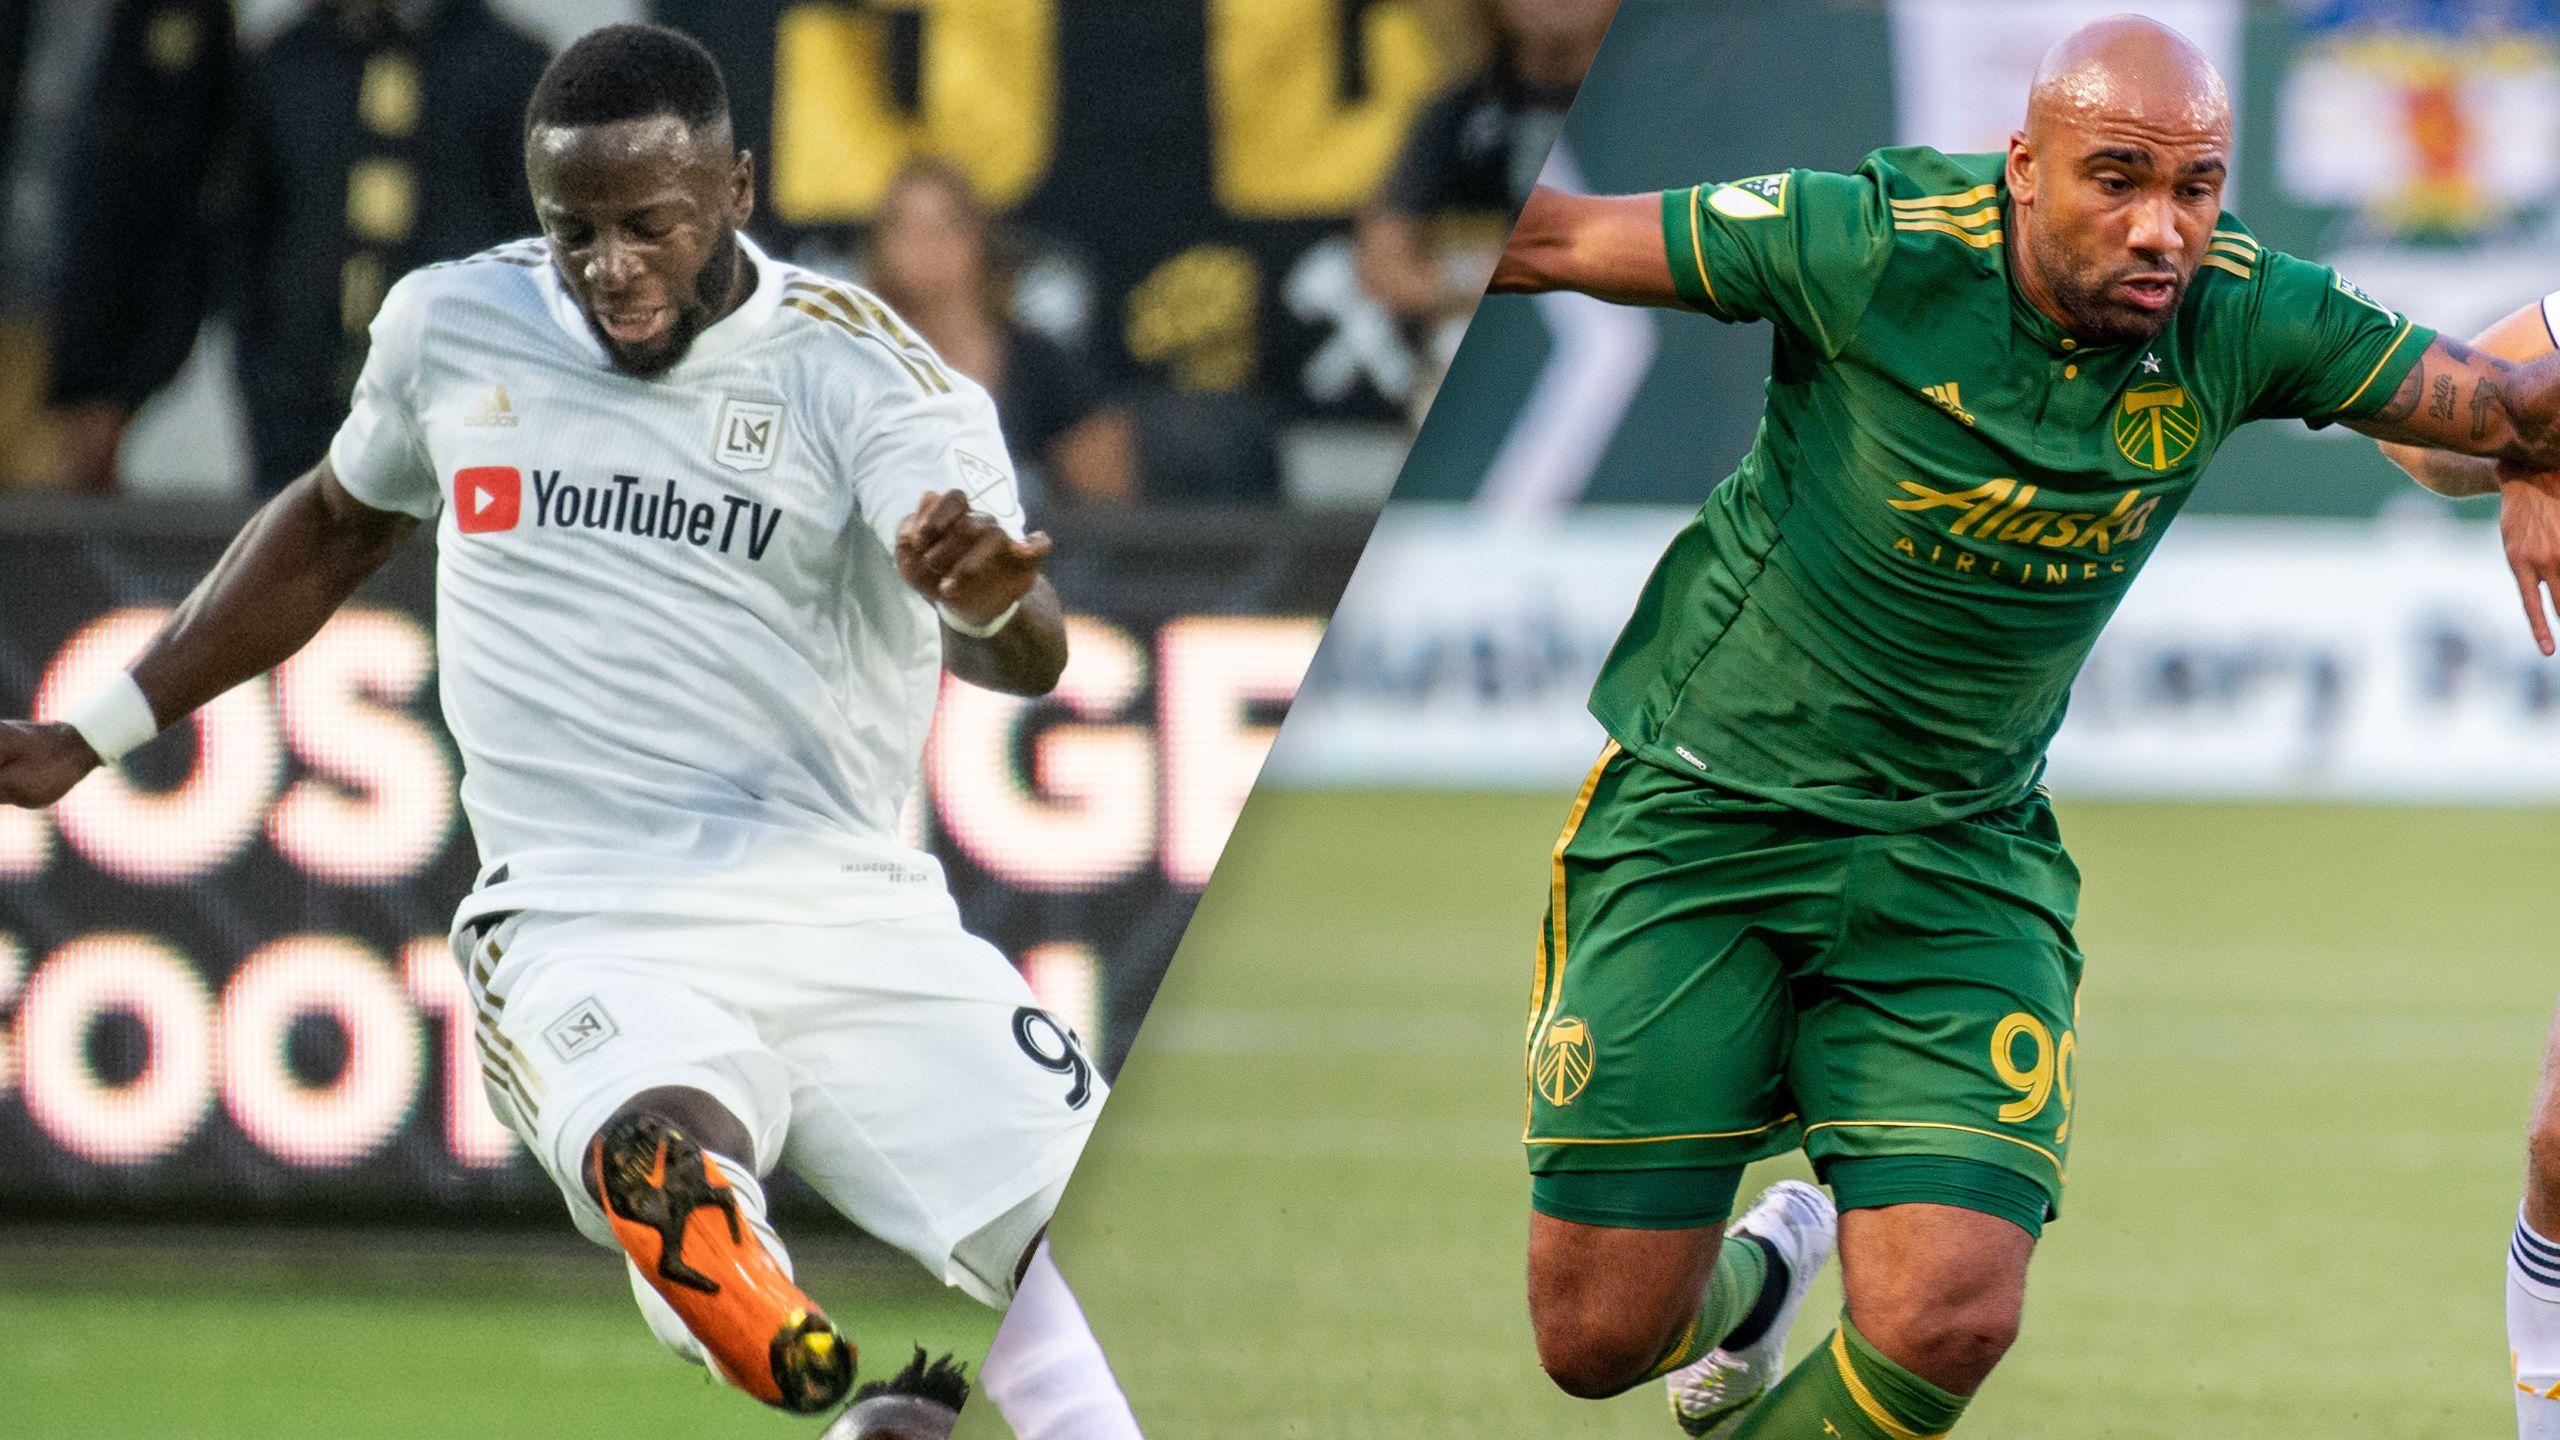 LAFC vs. Portland Timbers